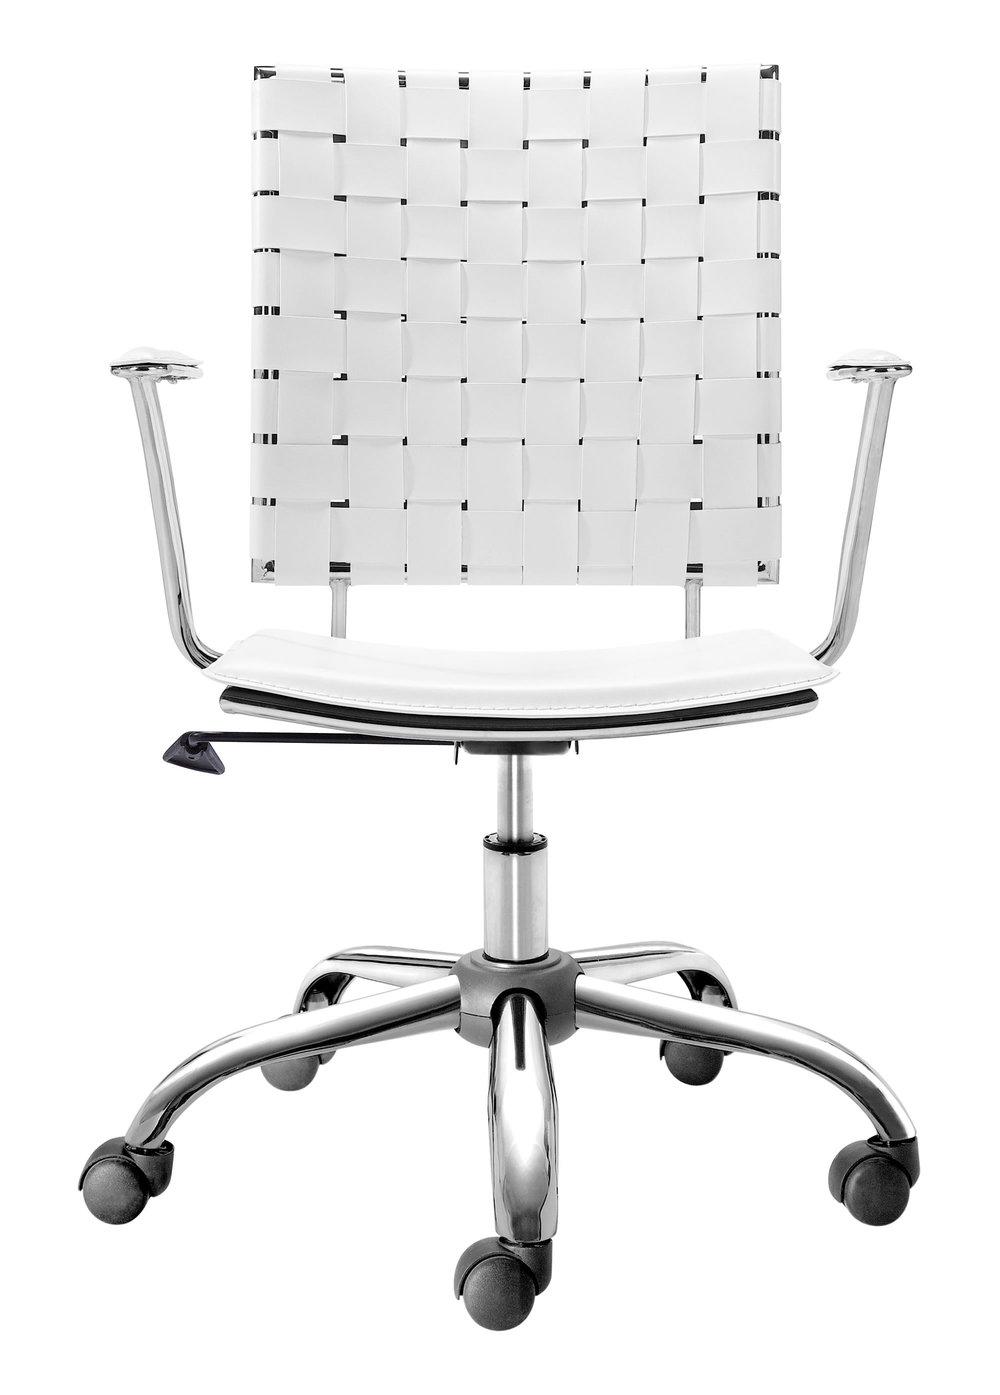 Zuo Modern Contemporary - Criss Cross Office Chair White